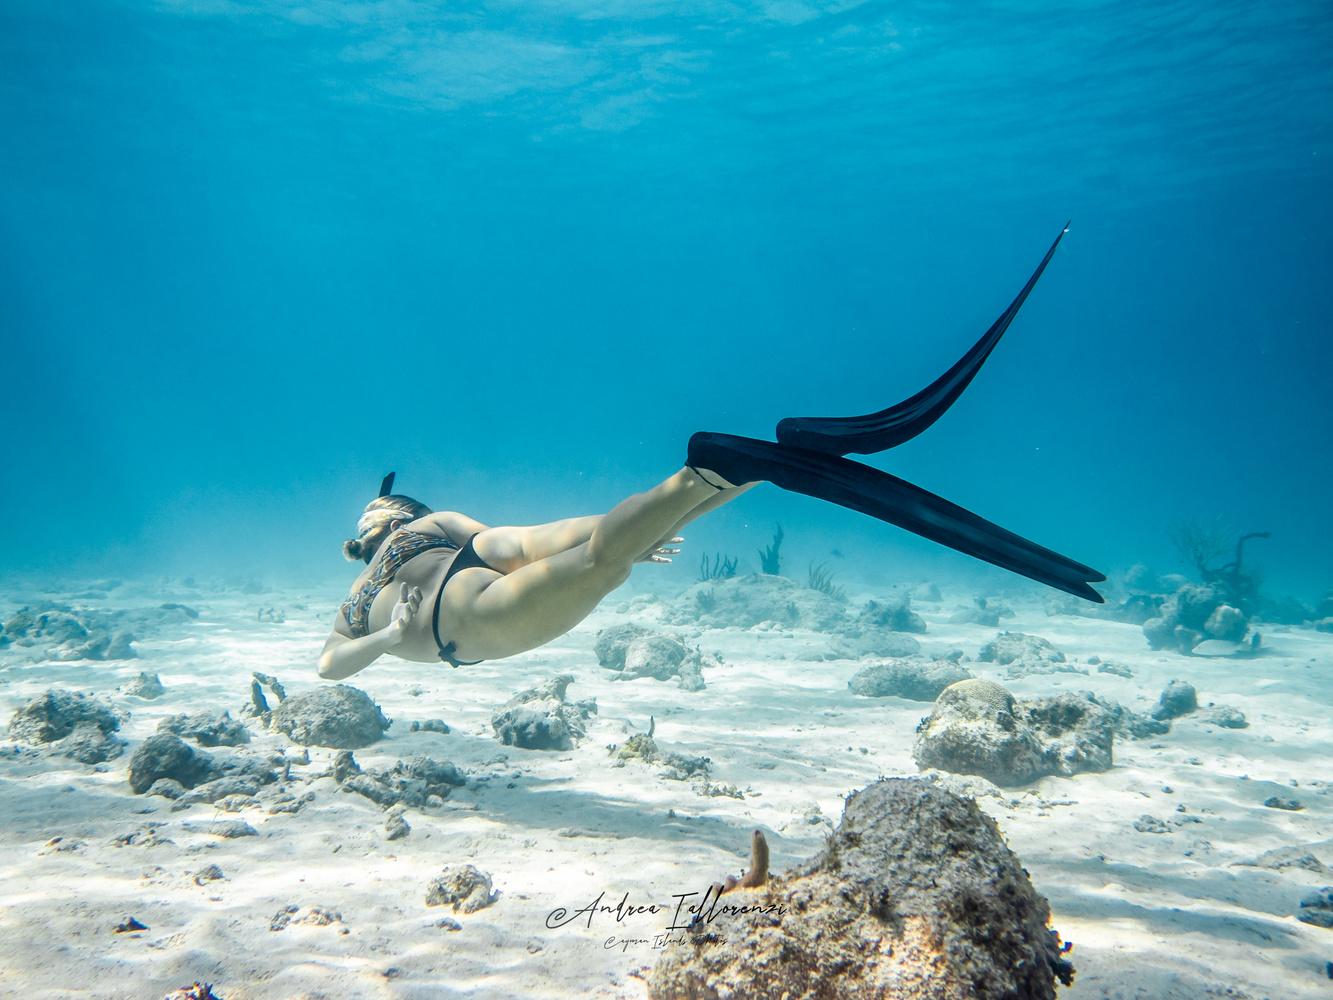 swim by andrea Iallorenzi